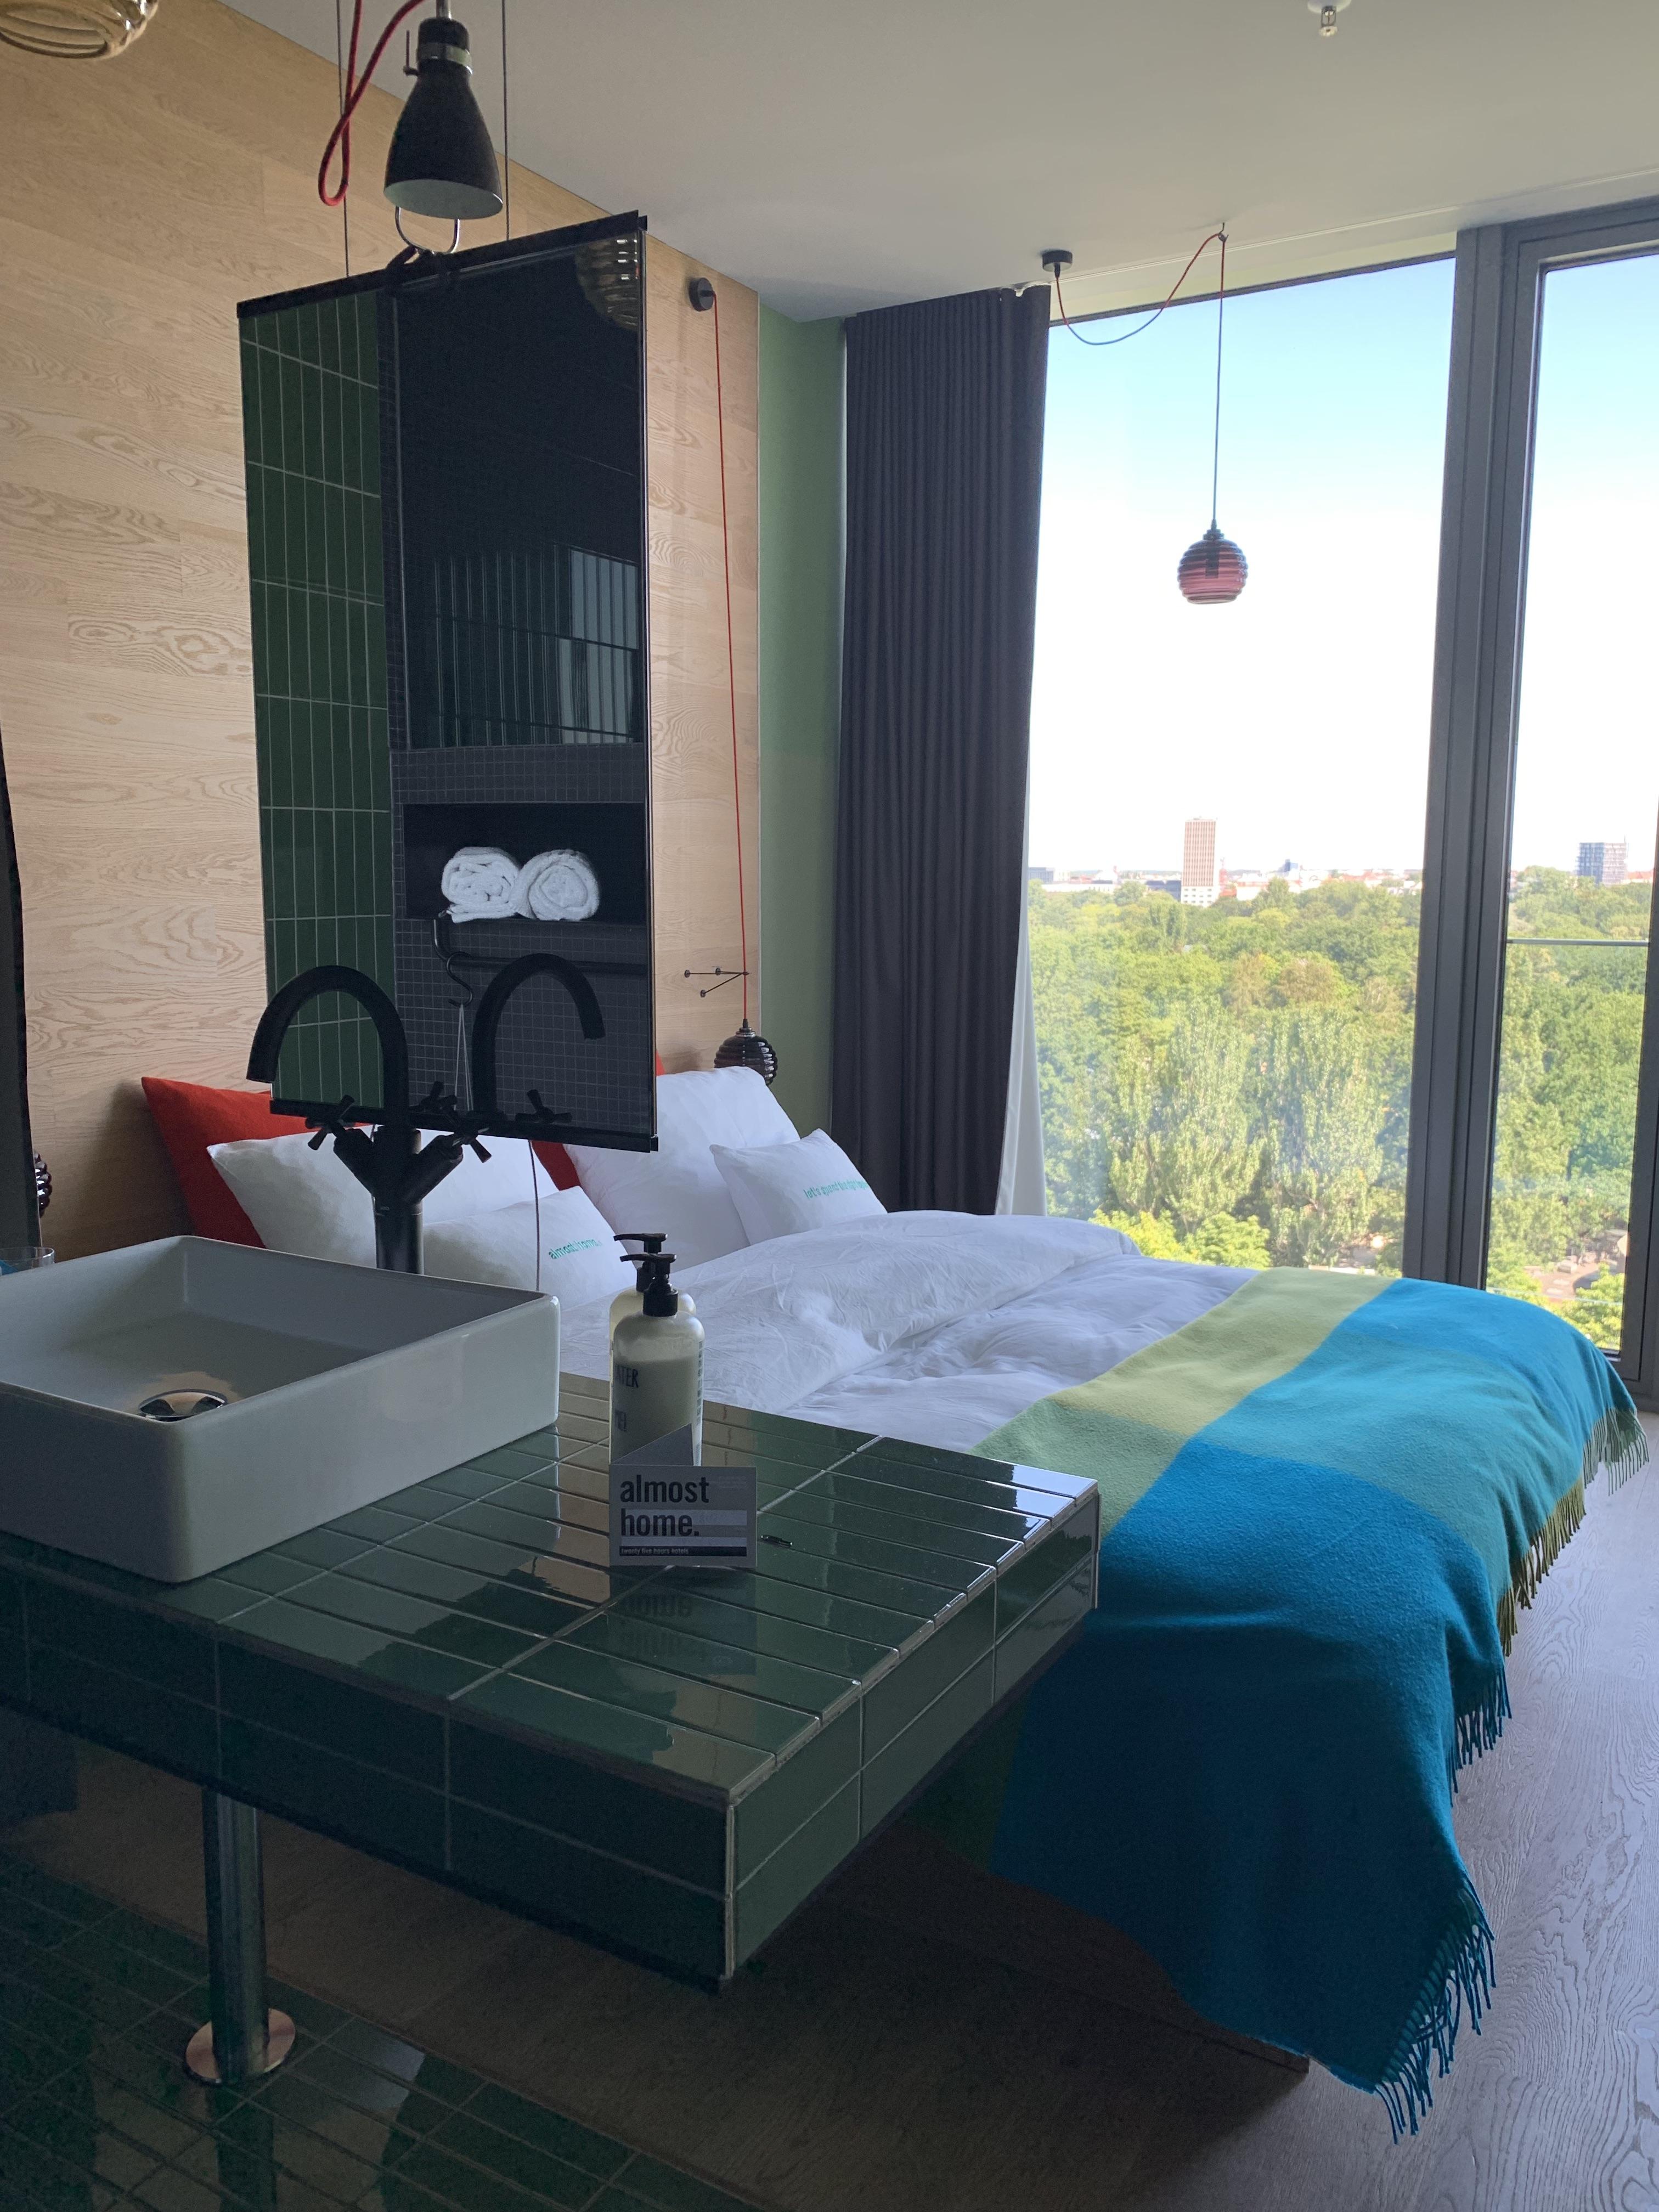 25 Hours Hotel Bikini Berlin Shirin Tabatabai Blog